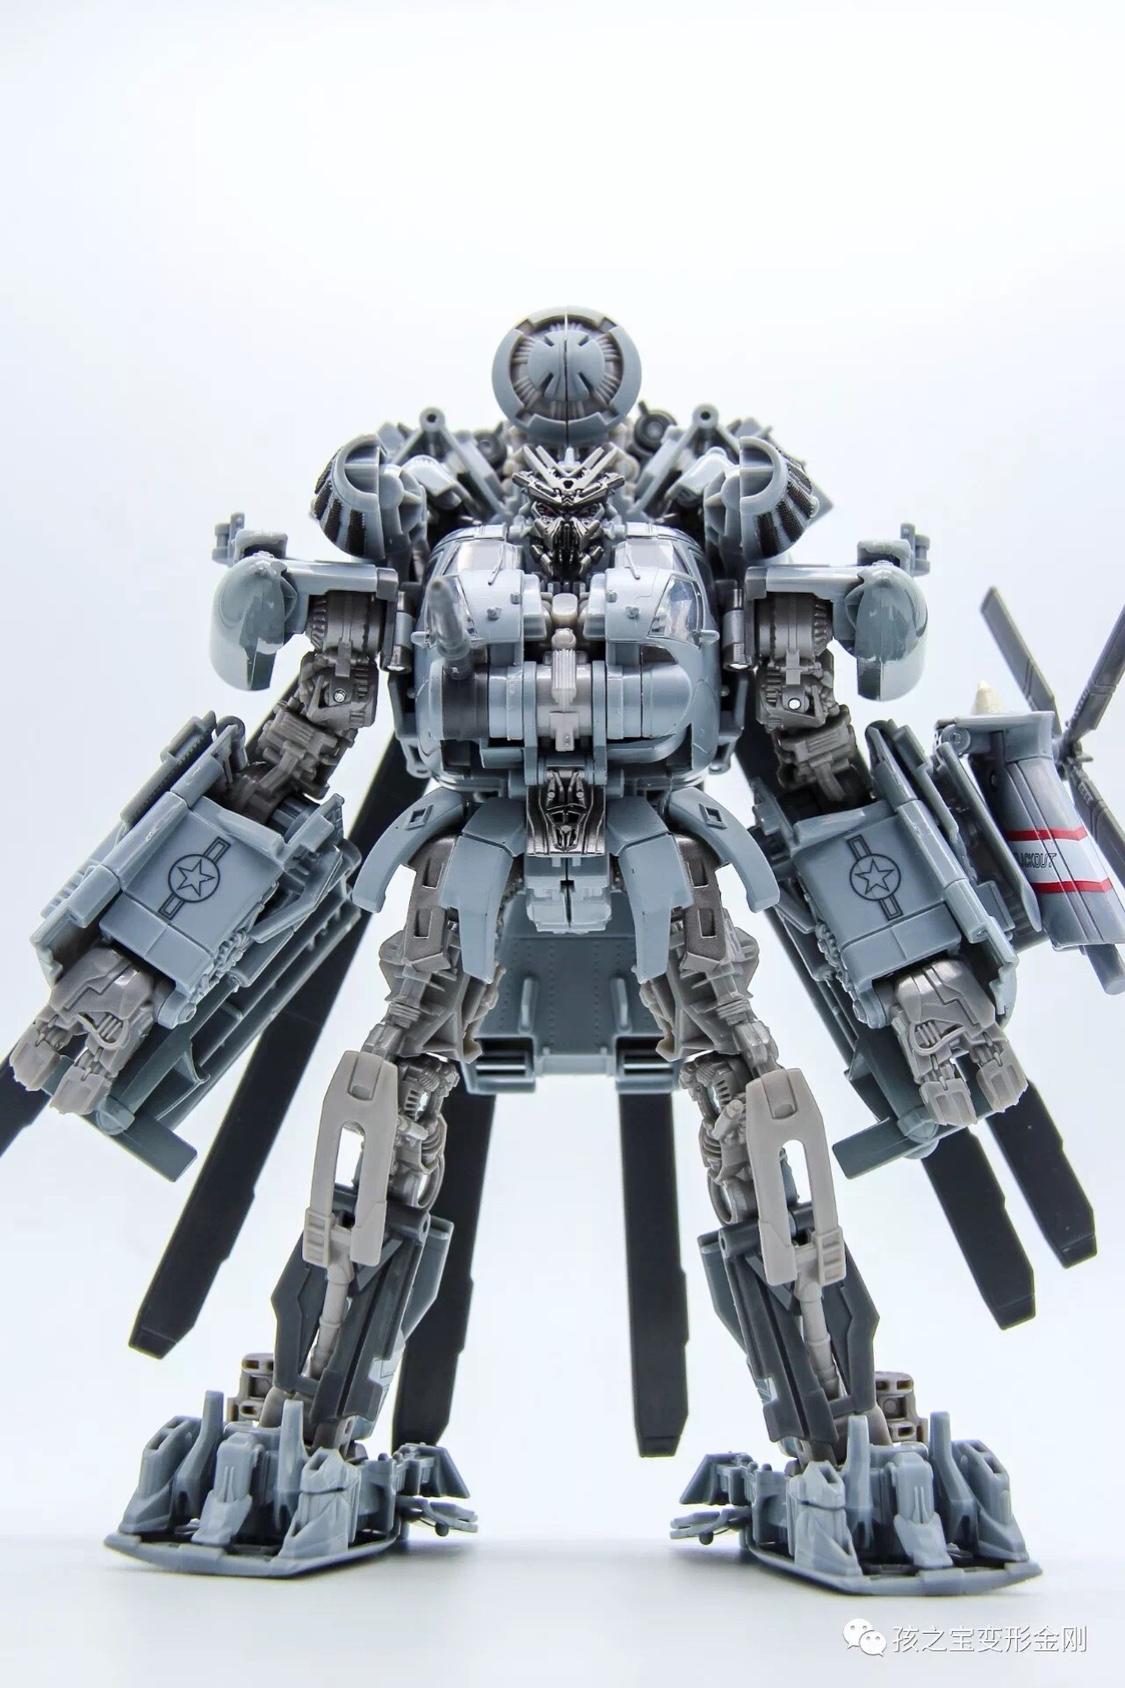 Transformers Studio Series 08 Blackout Decepticon Leader Class Action Figure USA